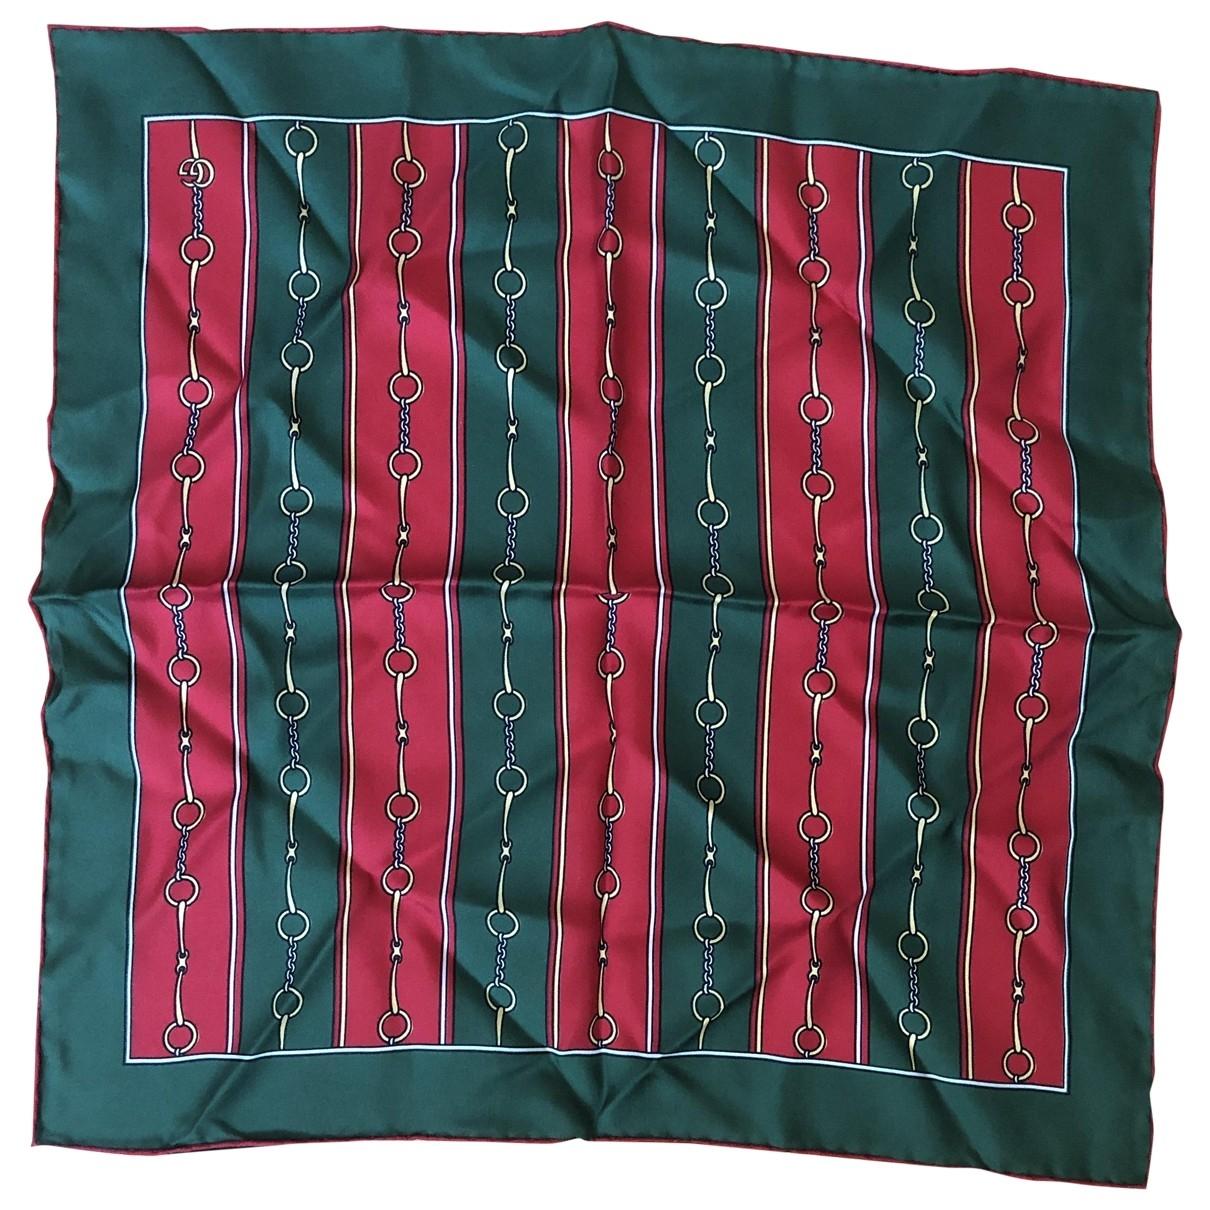 Gucci \N Green Silk scarf & pocket squares for Men \N